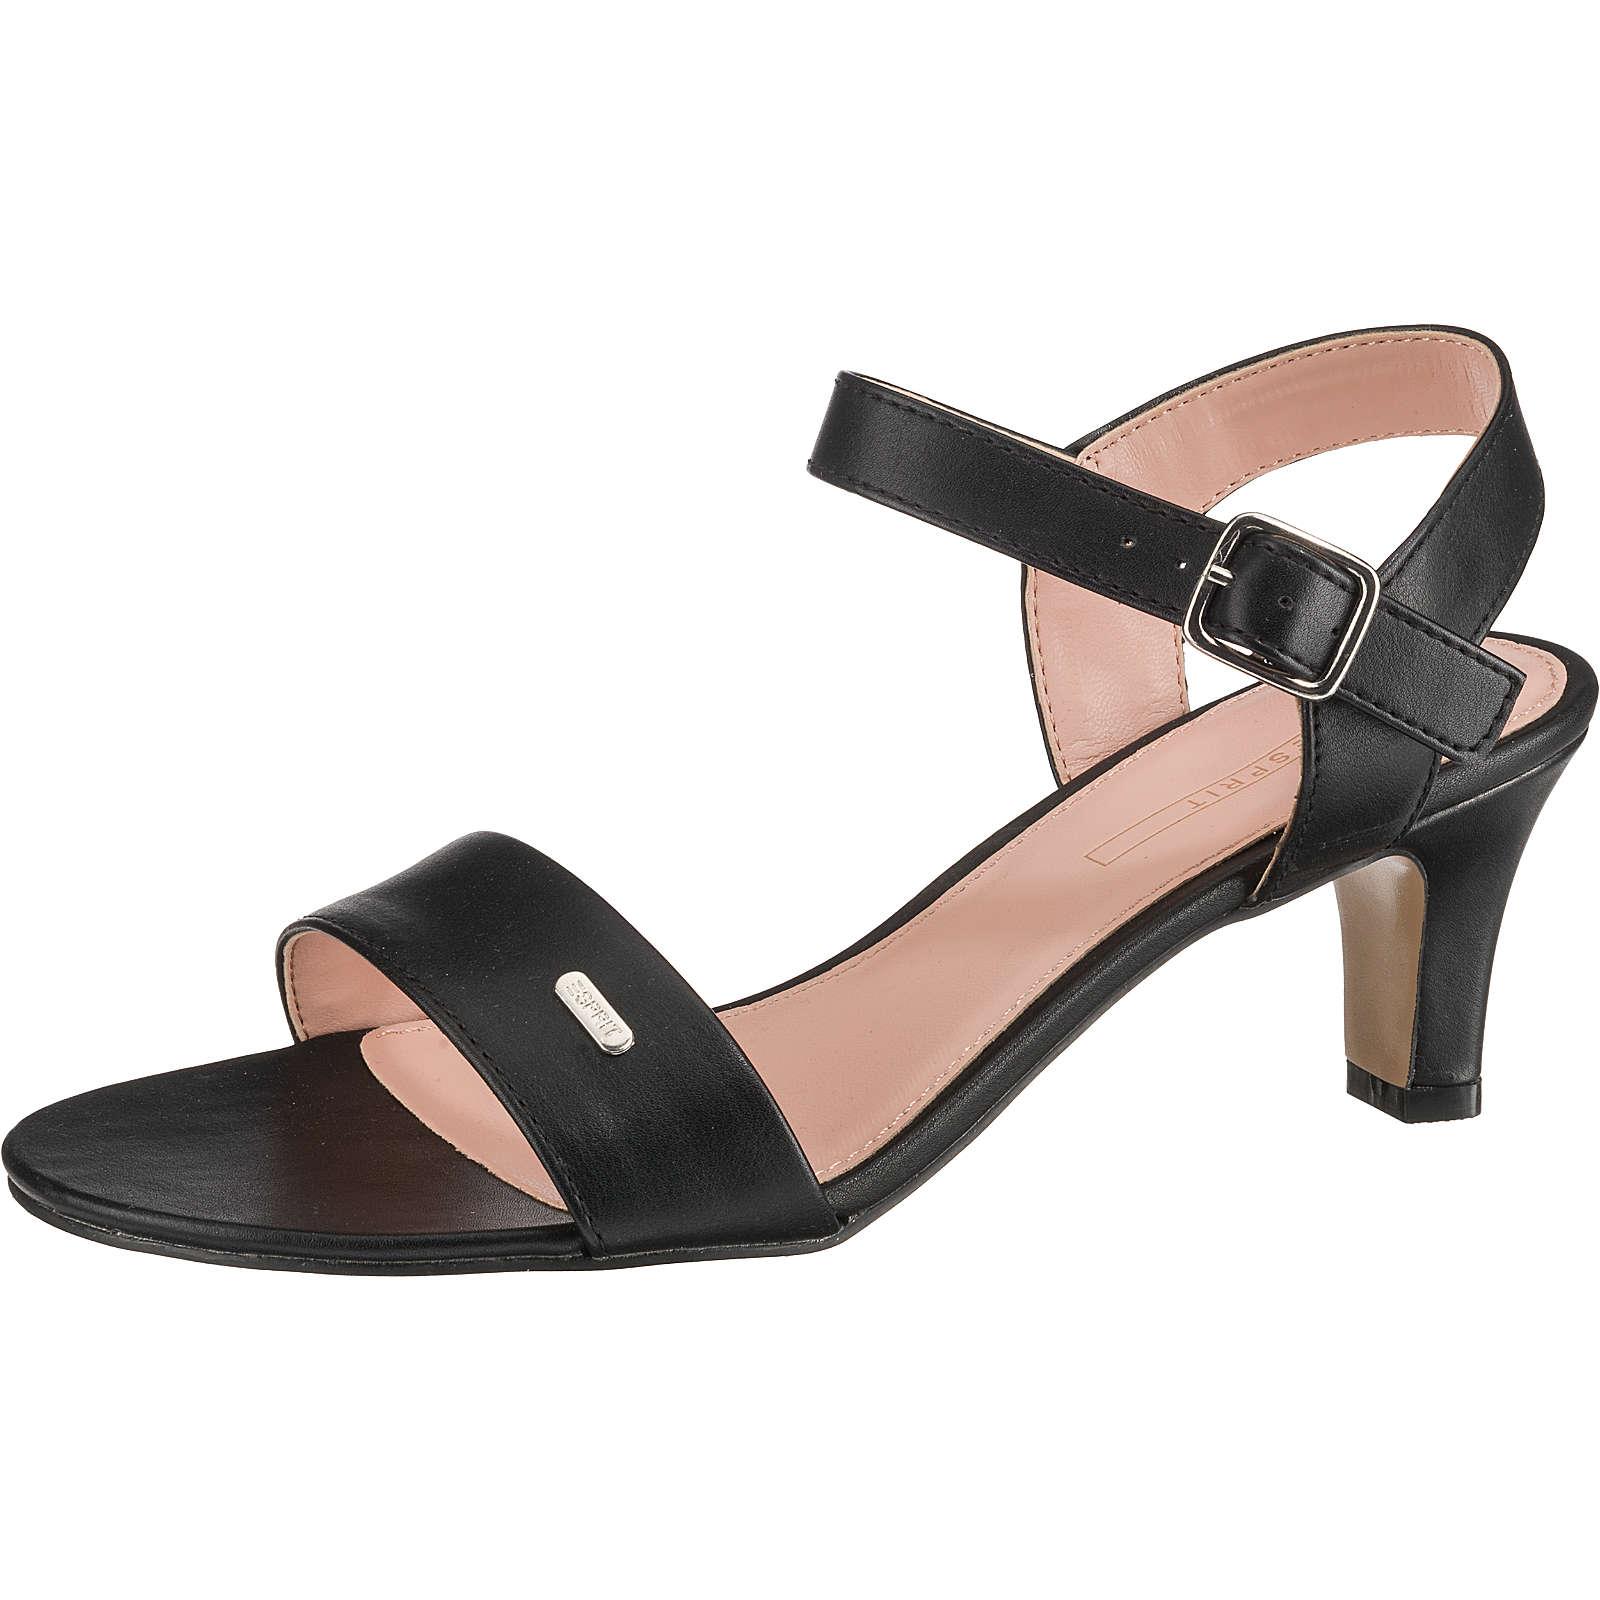 ESPRIT Delfy Sandal Klassische Sandaletten schwarz Damen Gr. 36